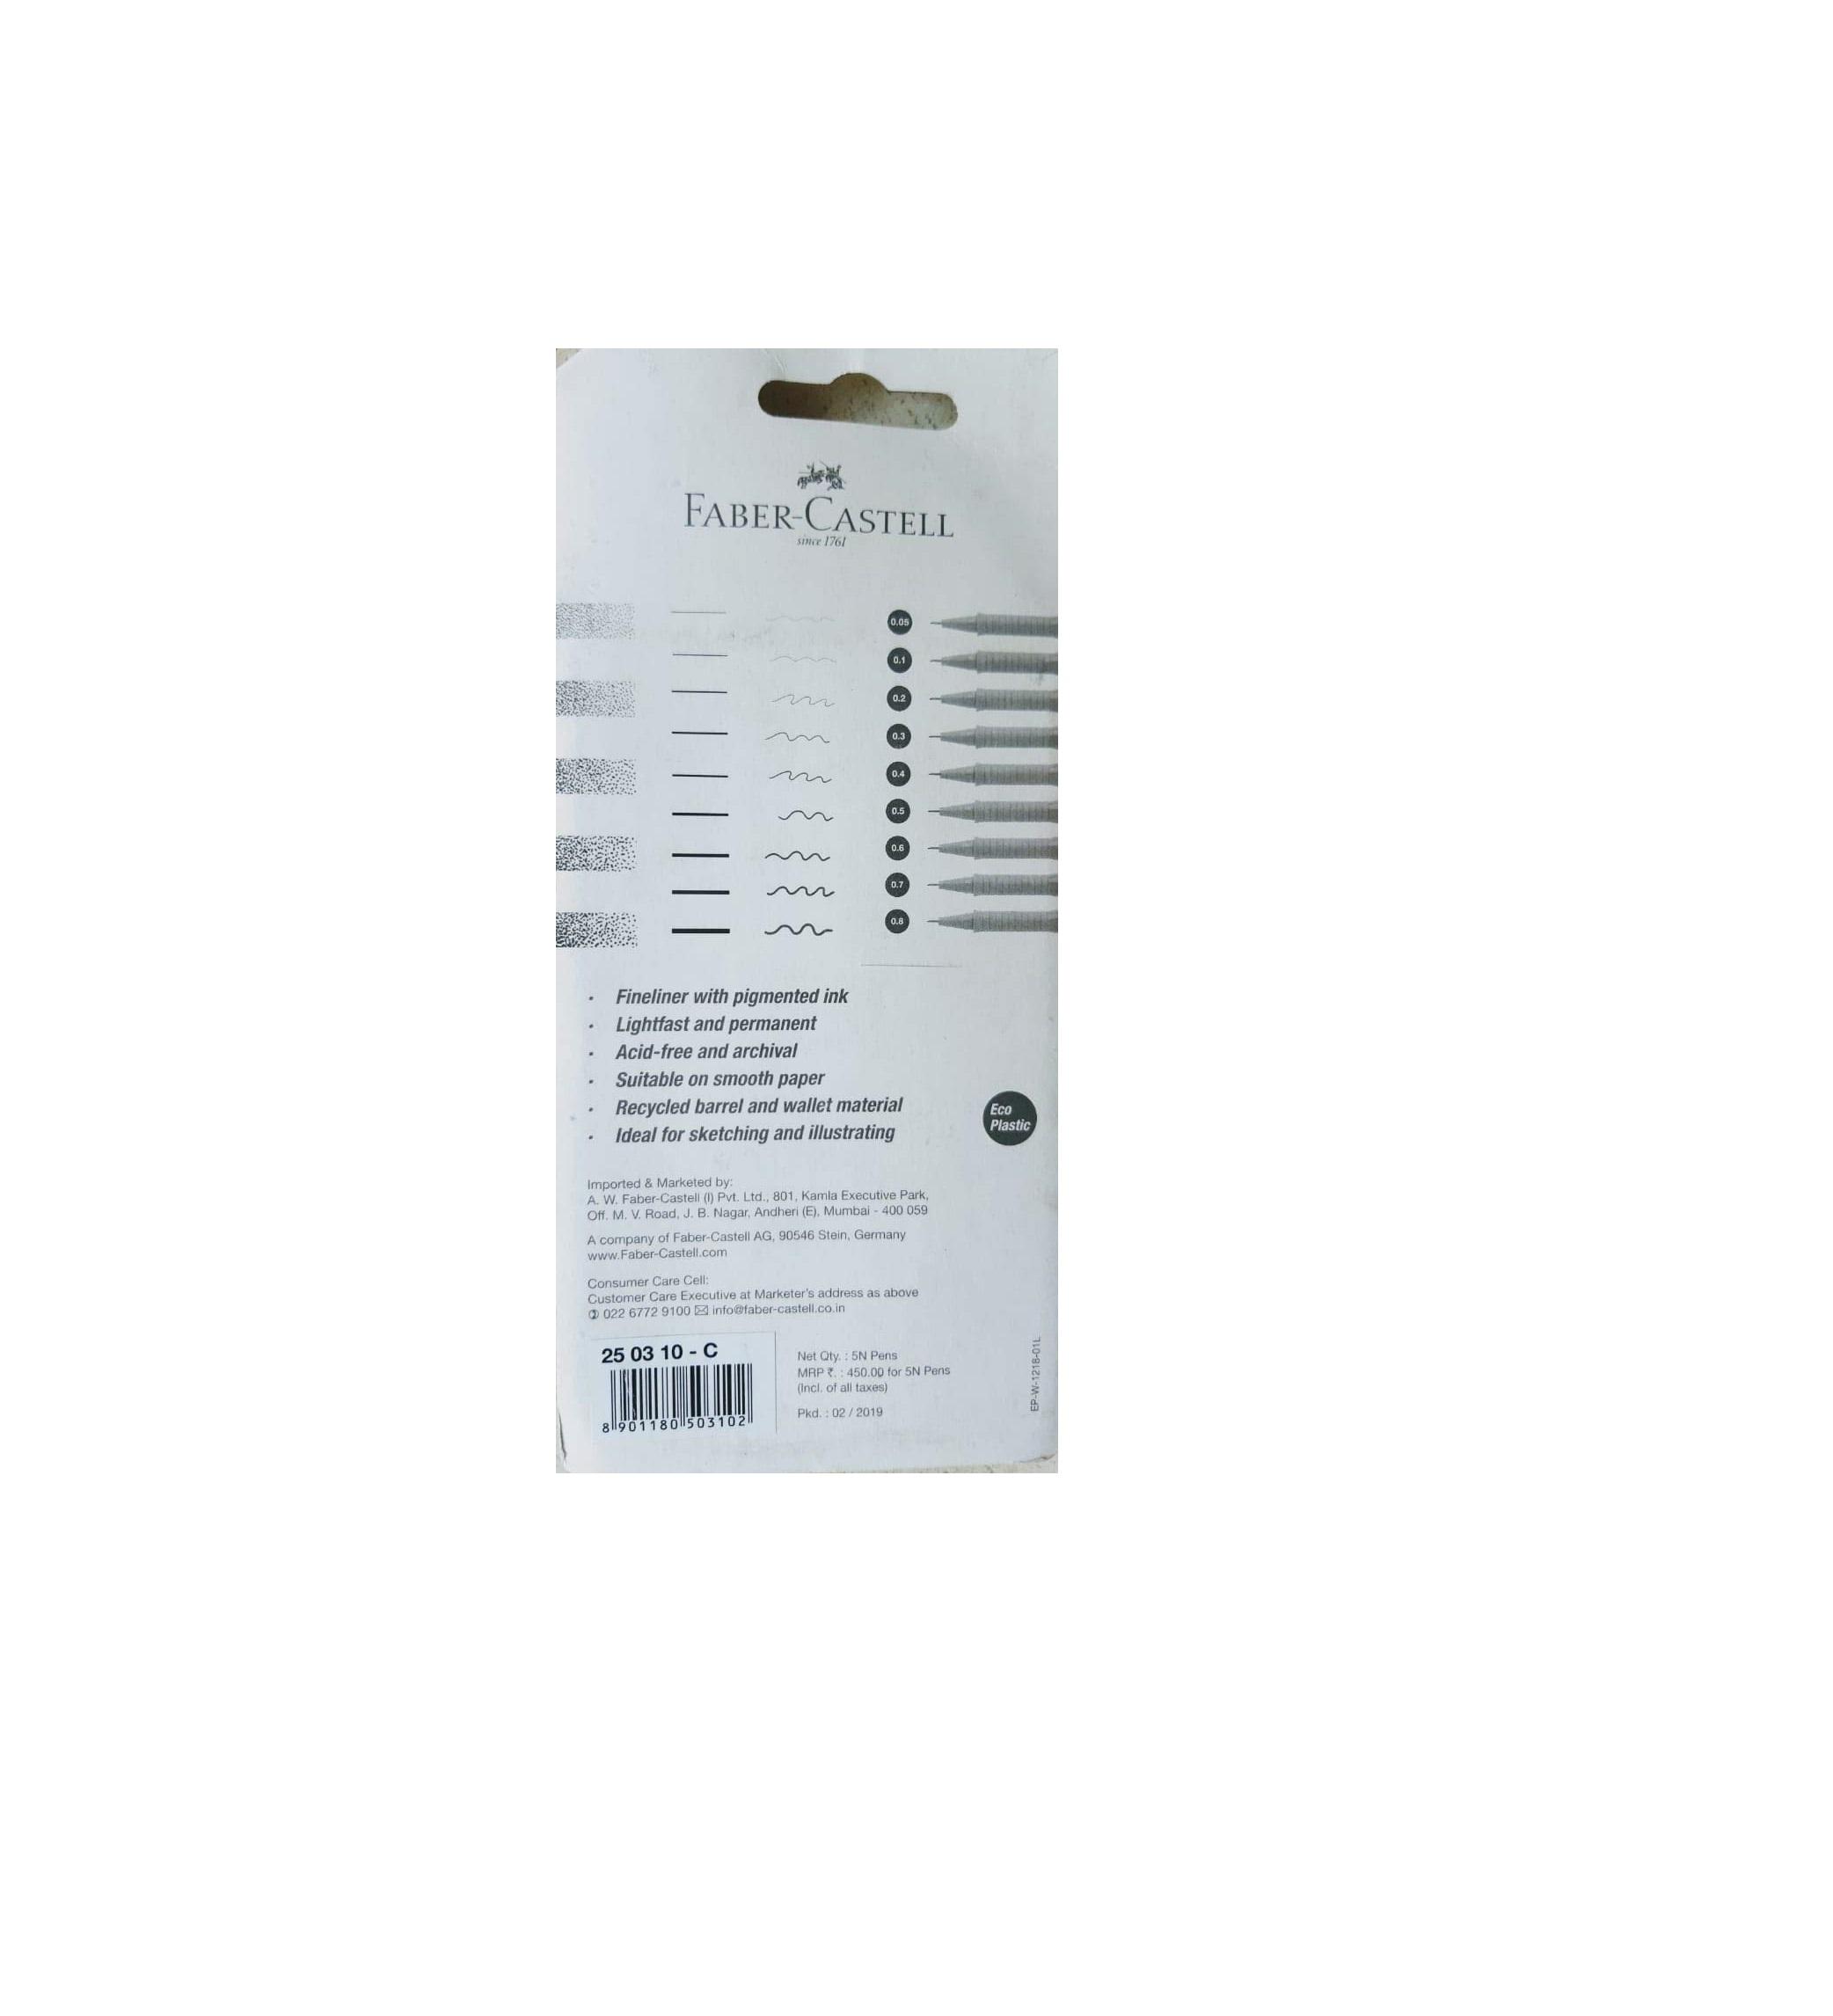 Faber Castell Ecco Pigment Fibre Tip Pen (0.1/0.1/0.1/0.1/0.6) Set C